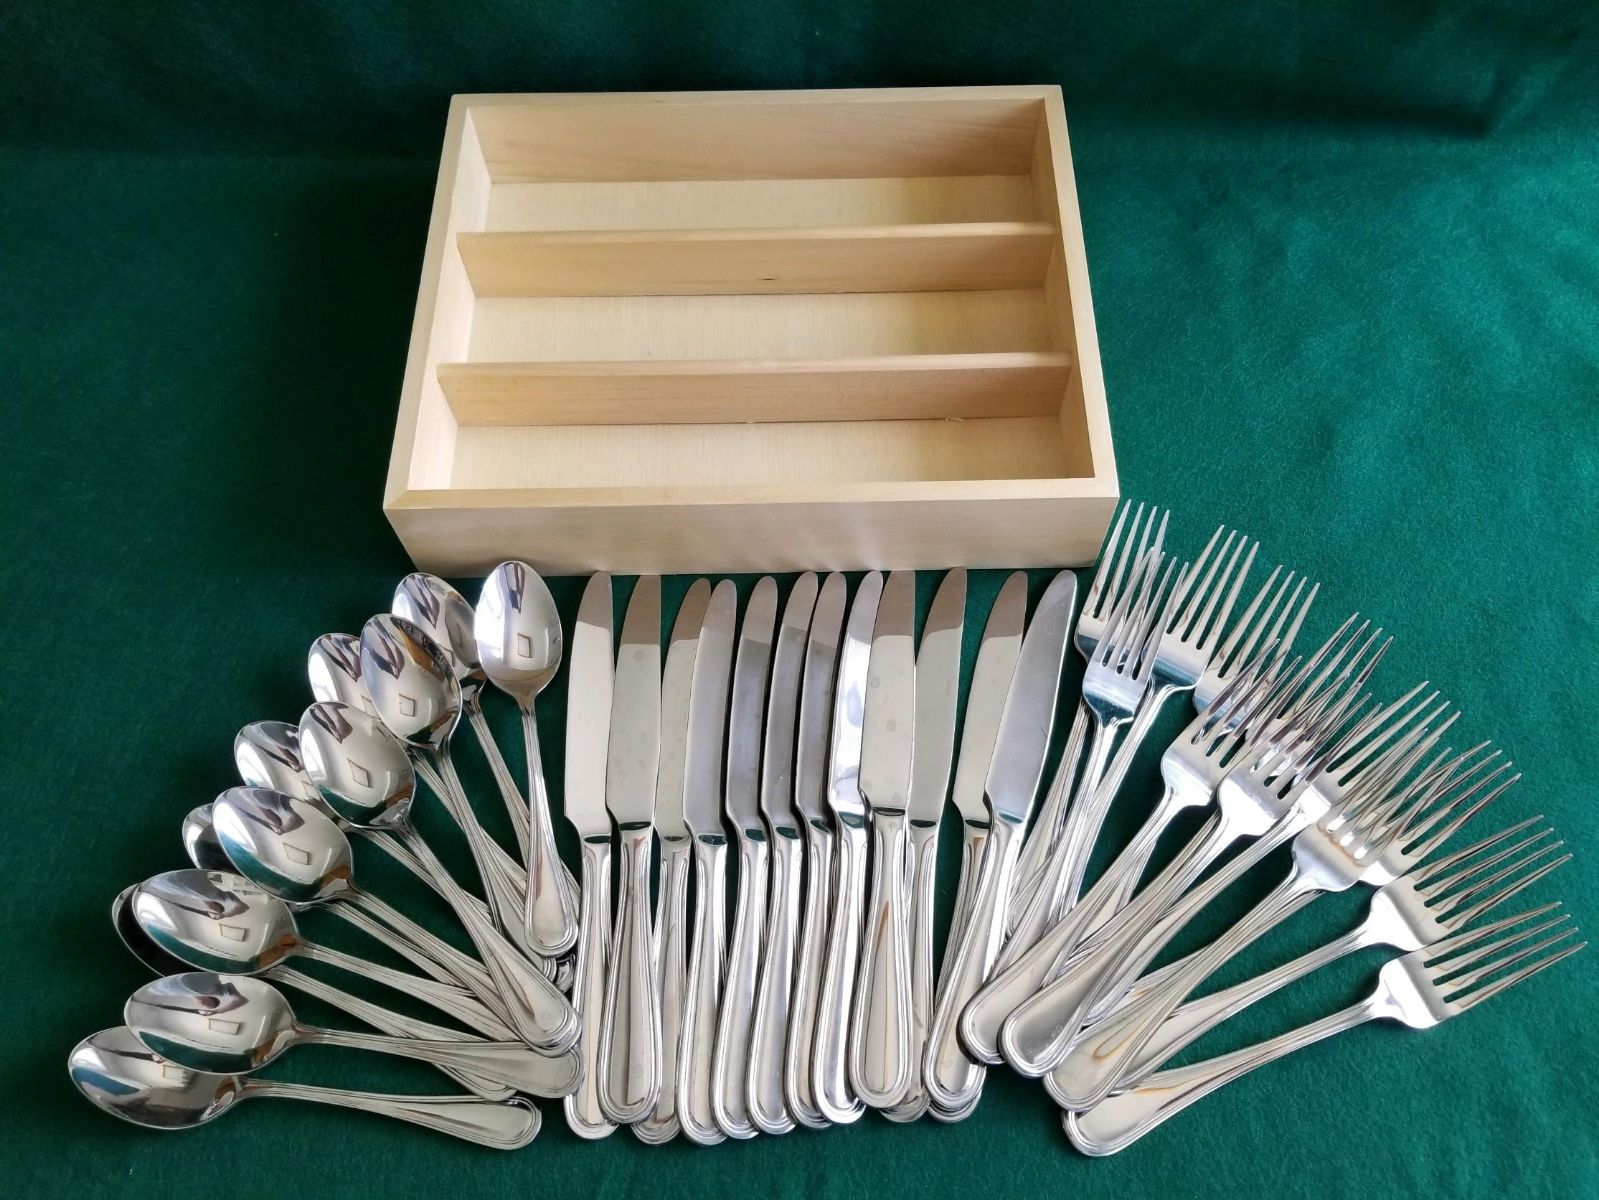 Stainless steel utensils- 36 piece set -